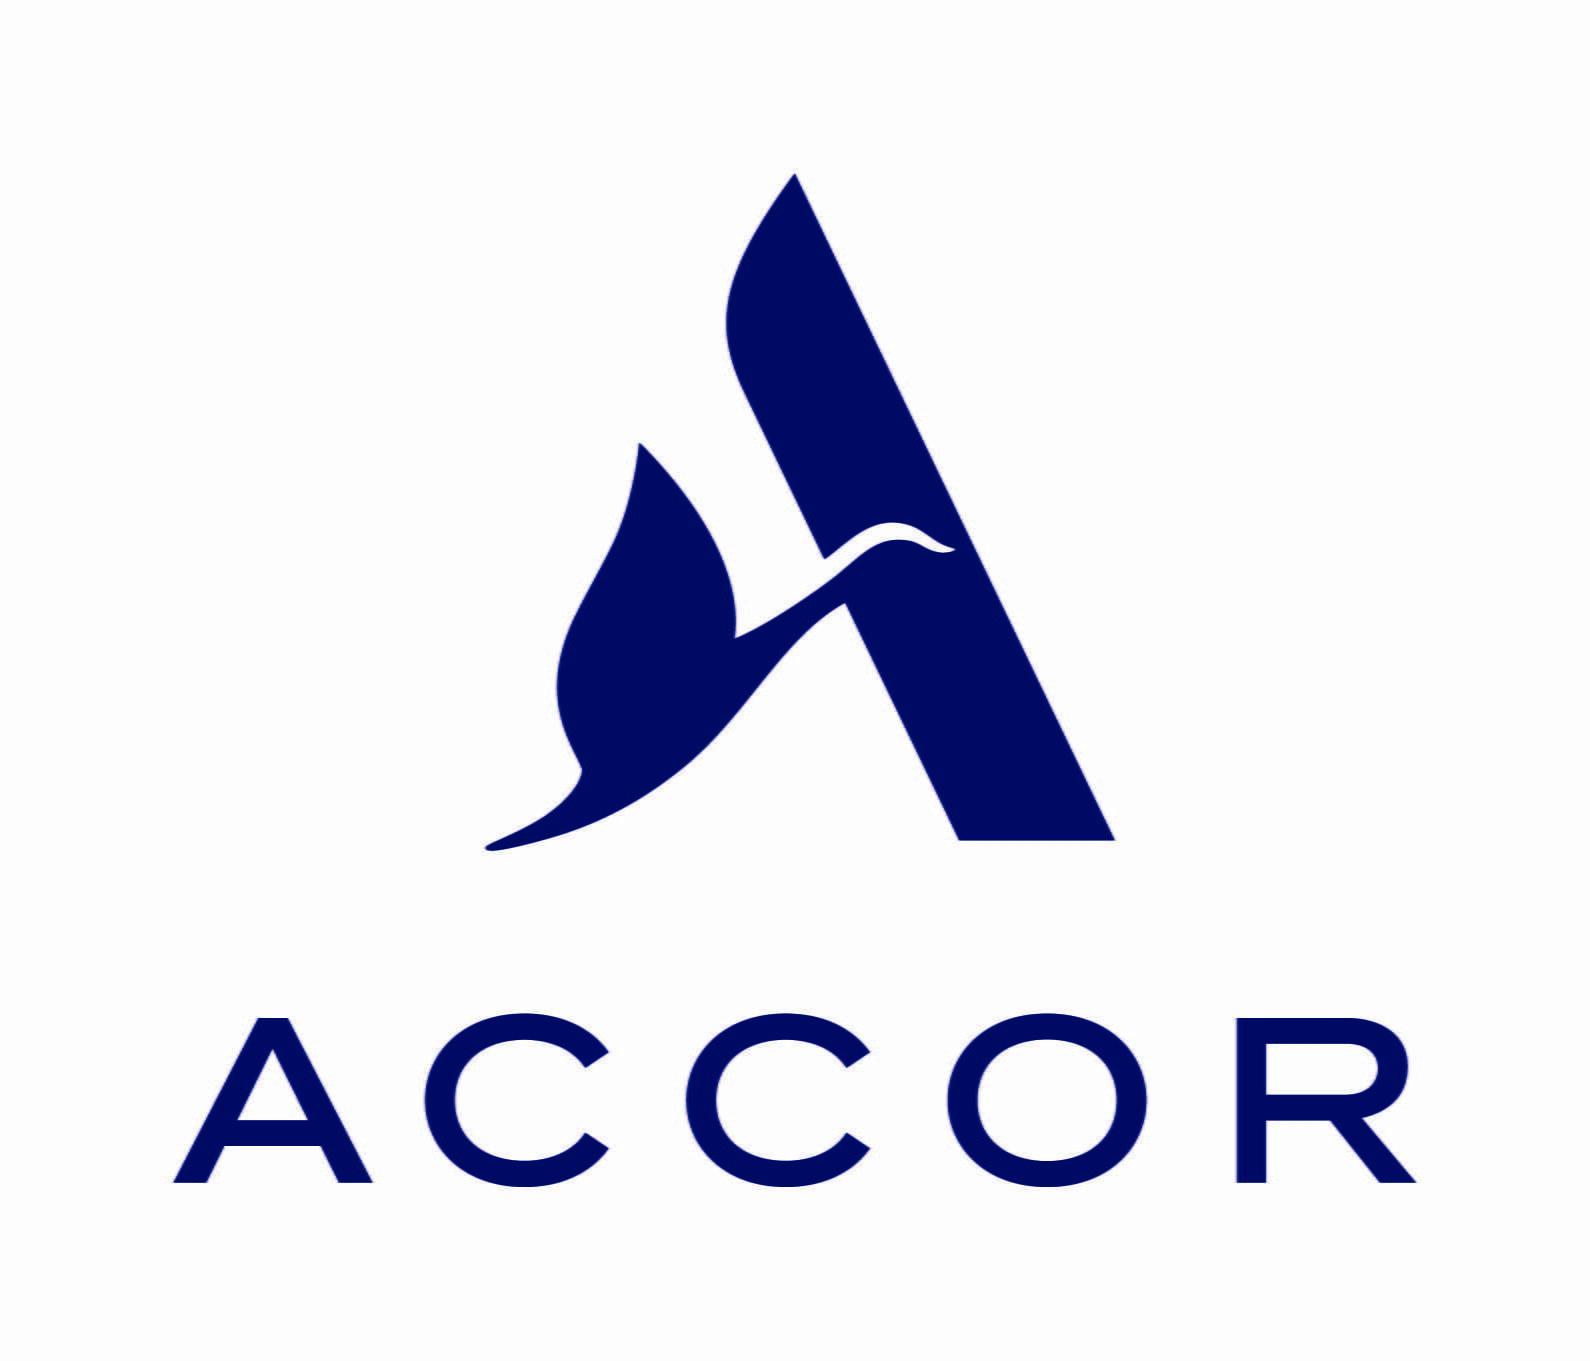 Accor_logo_Dark blue_4C